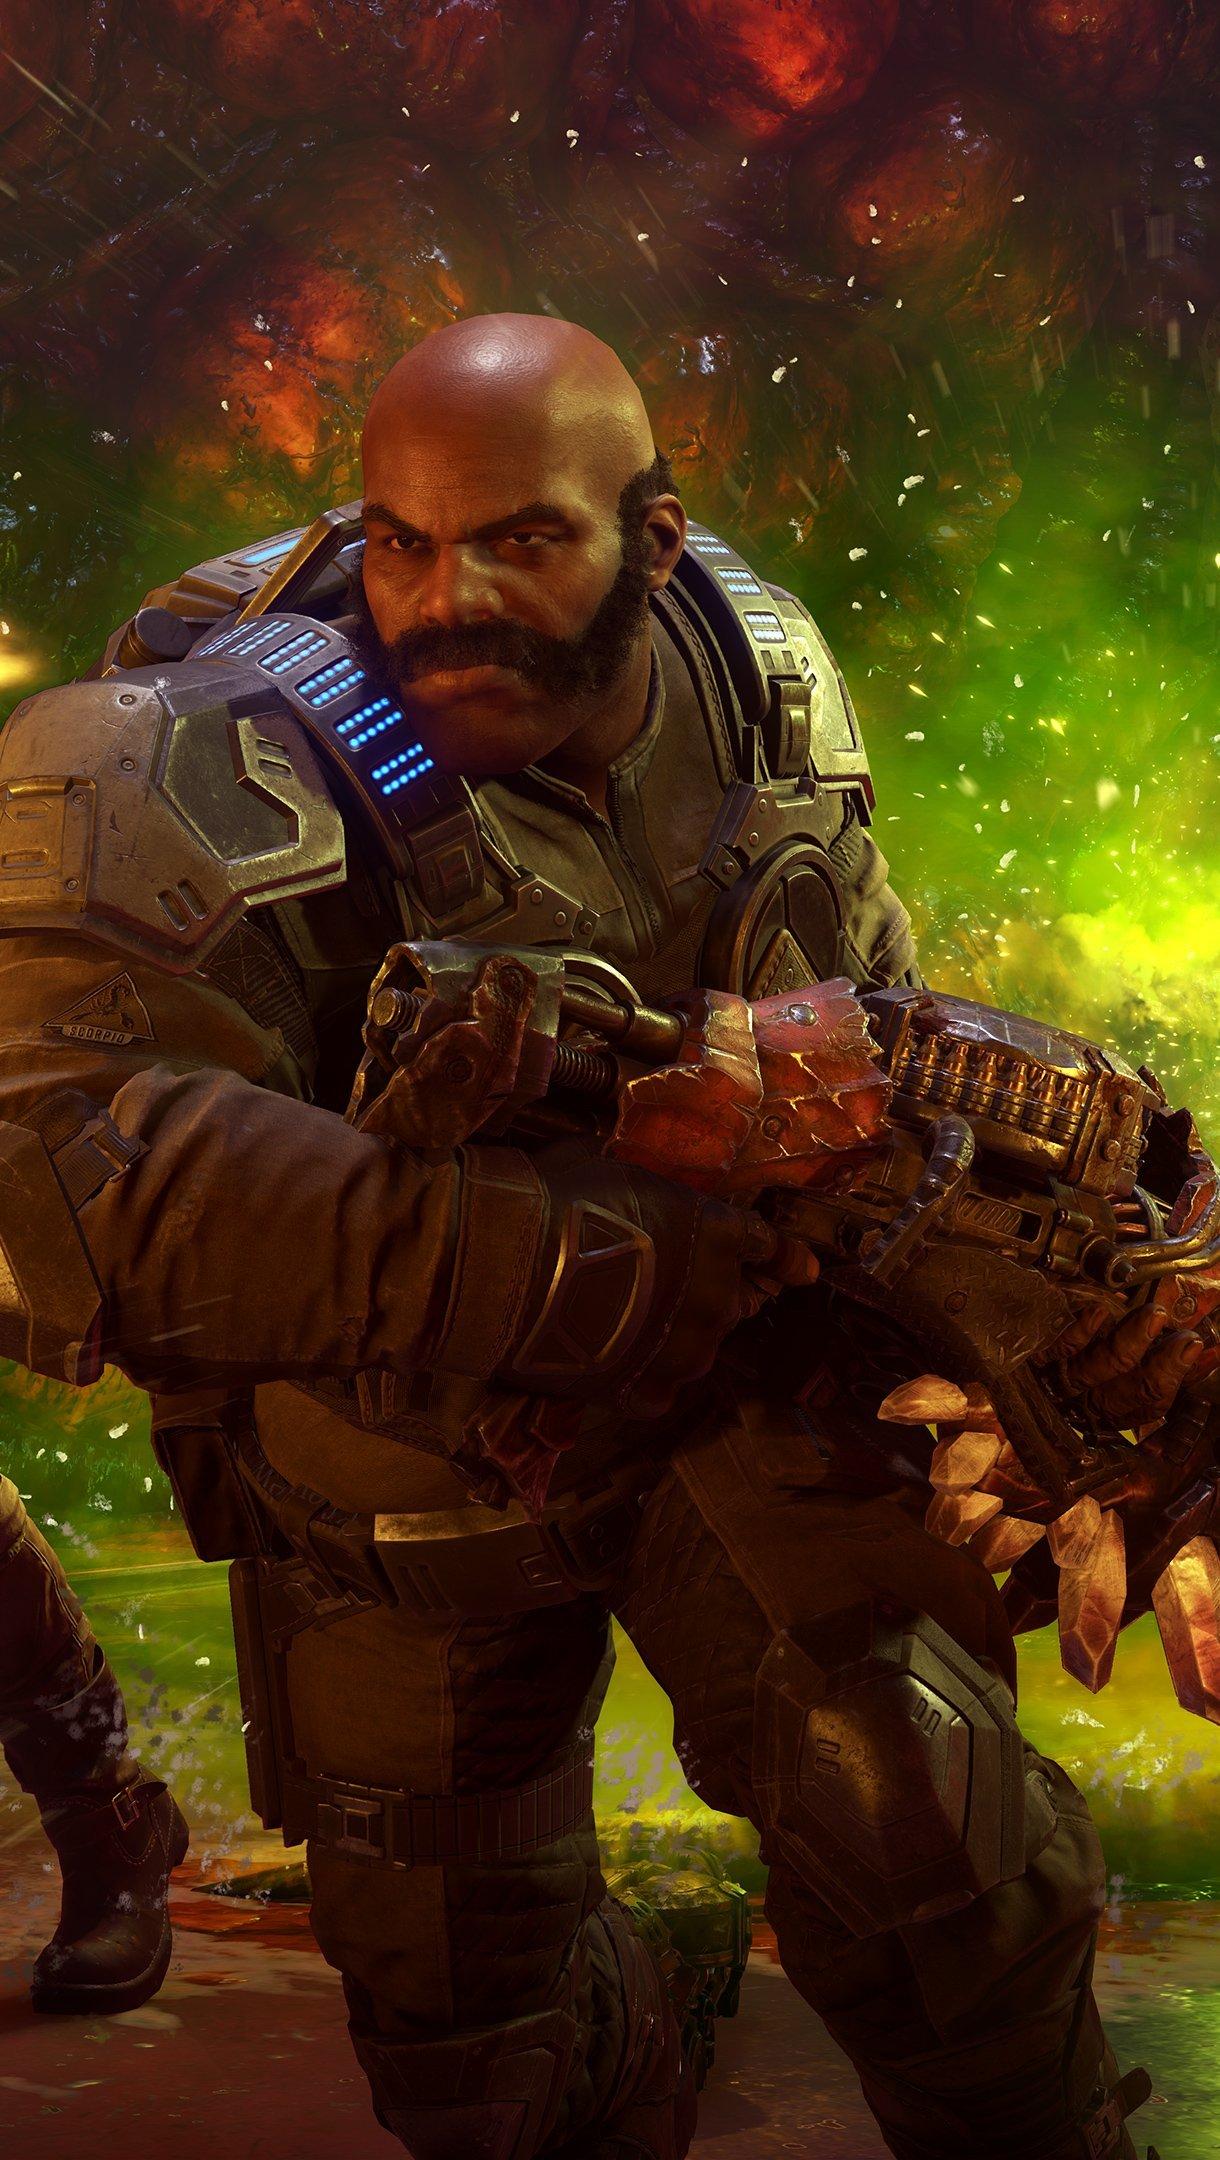 Fondos de pantalla Juego Gears of war 5 Vertical